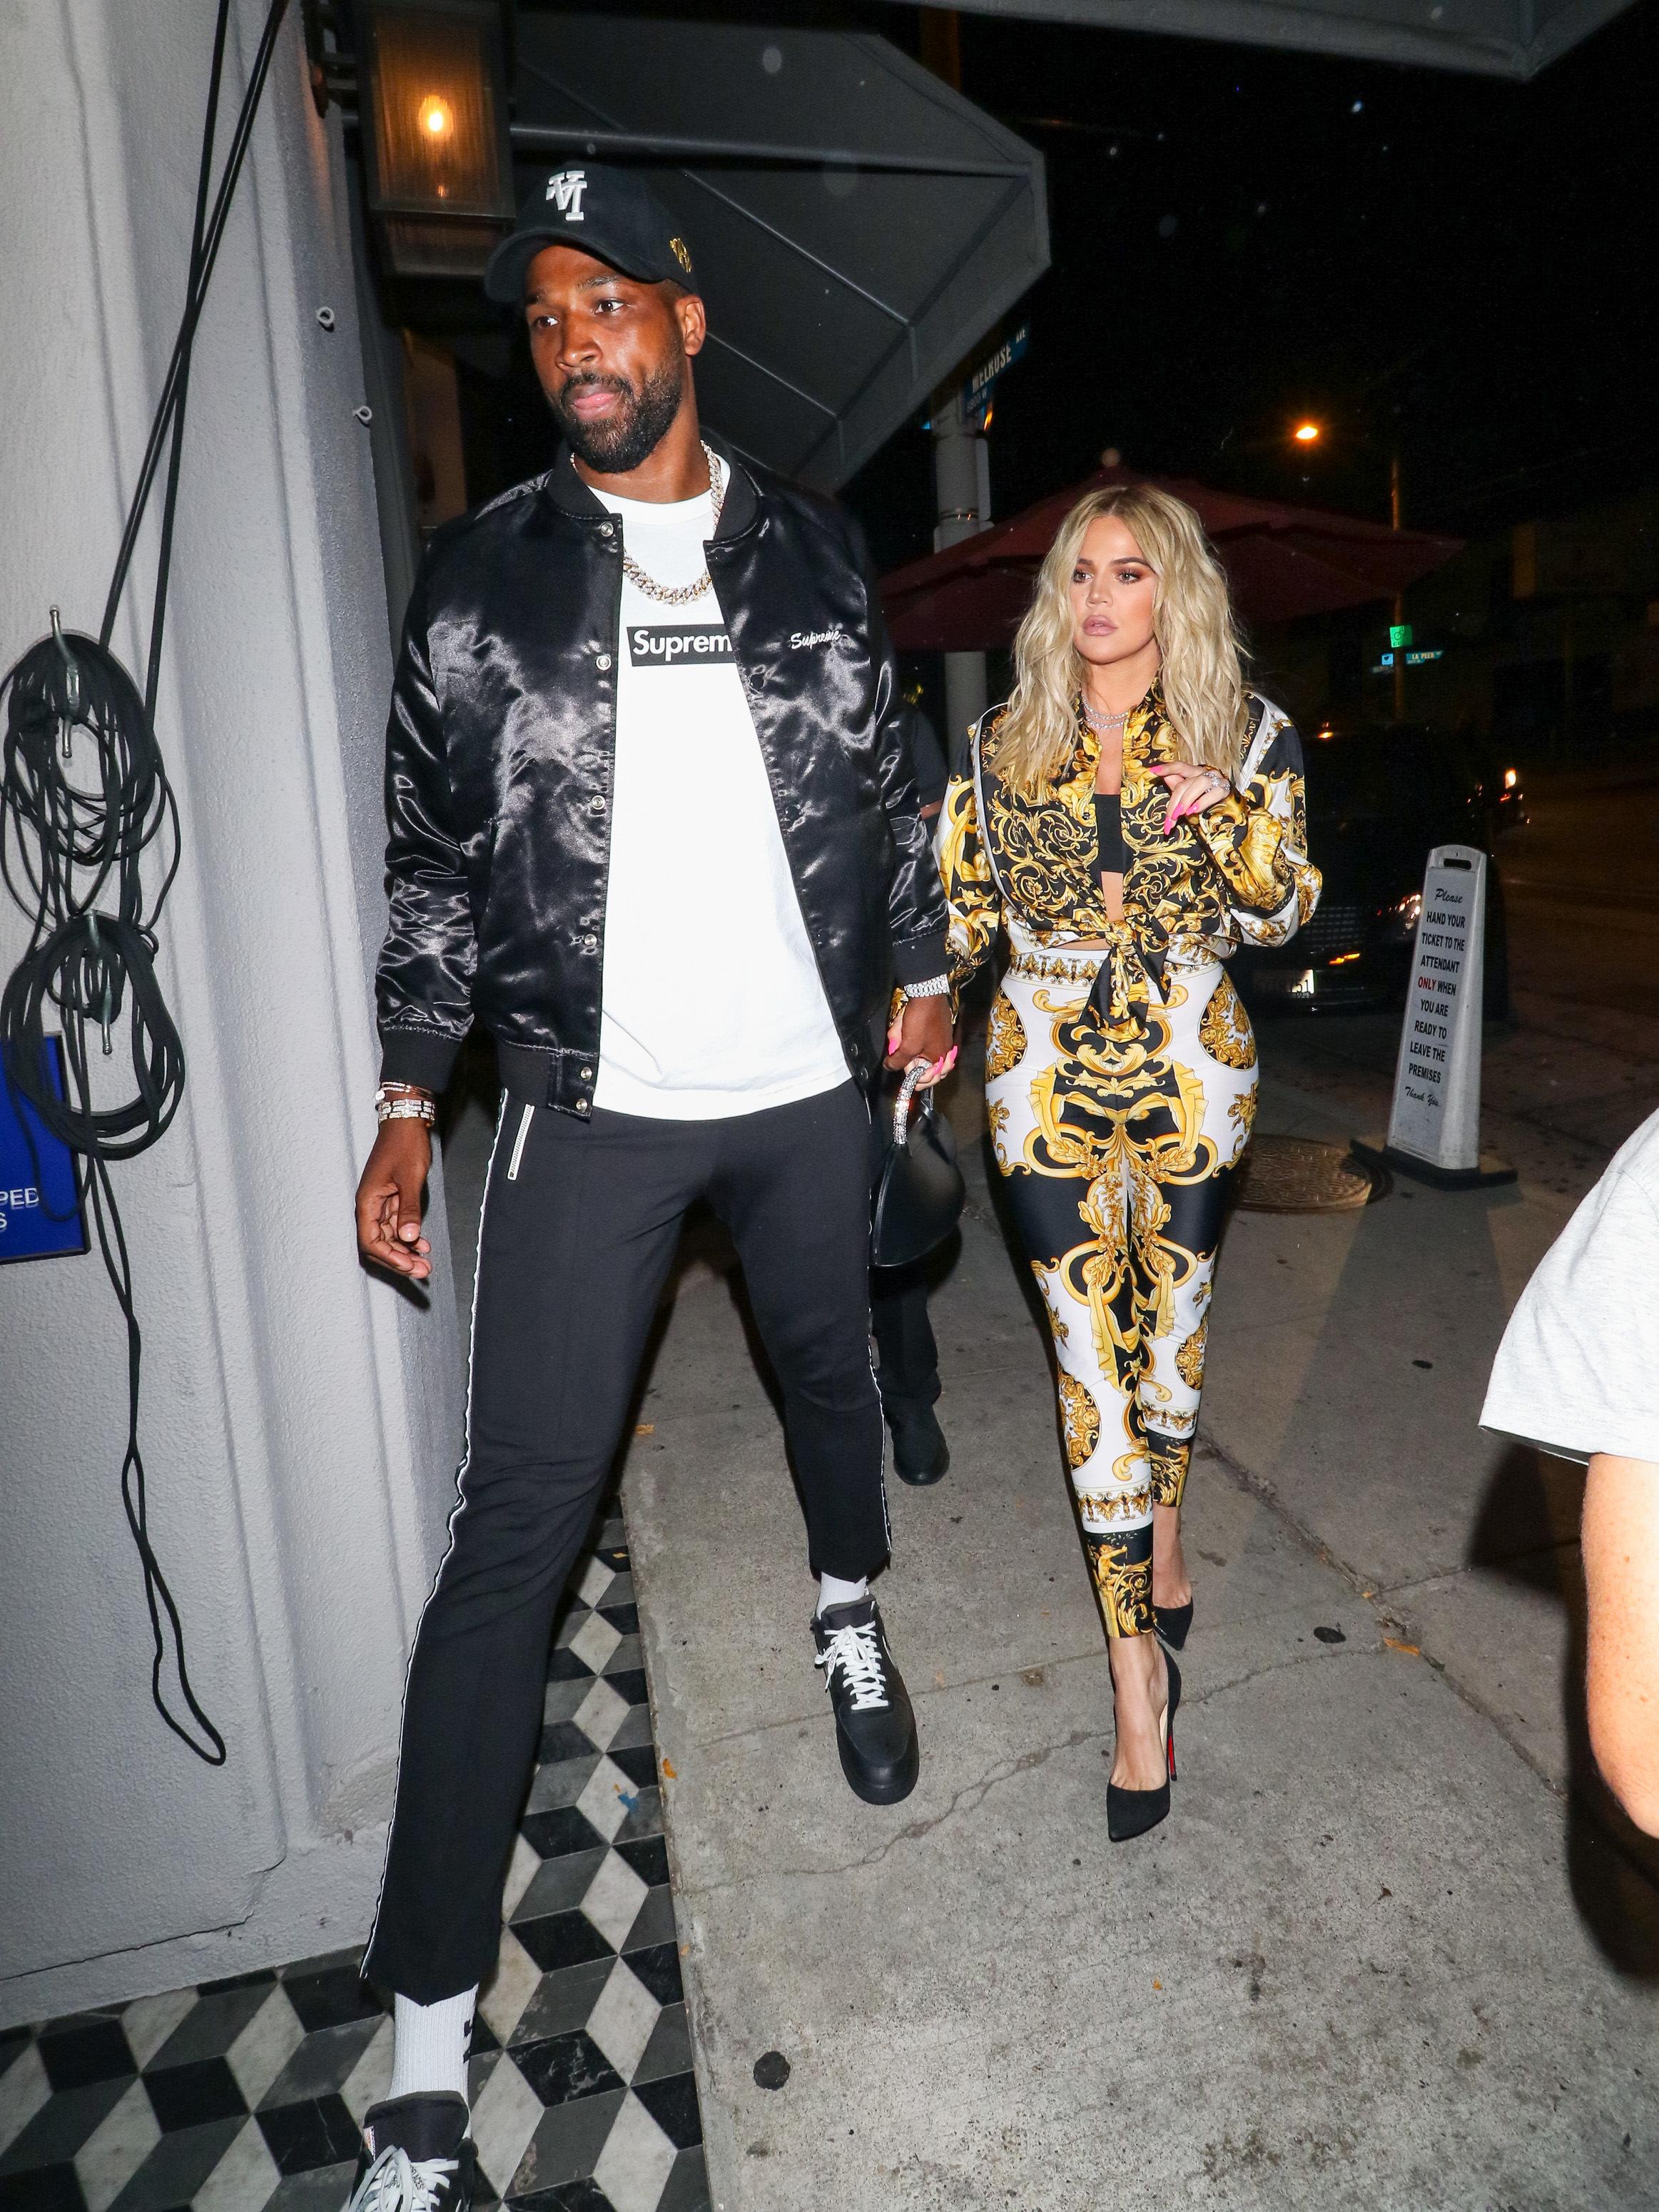 Khloe Kardashian Finally Shares Her Side Of Tristan Thompson Cheating